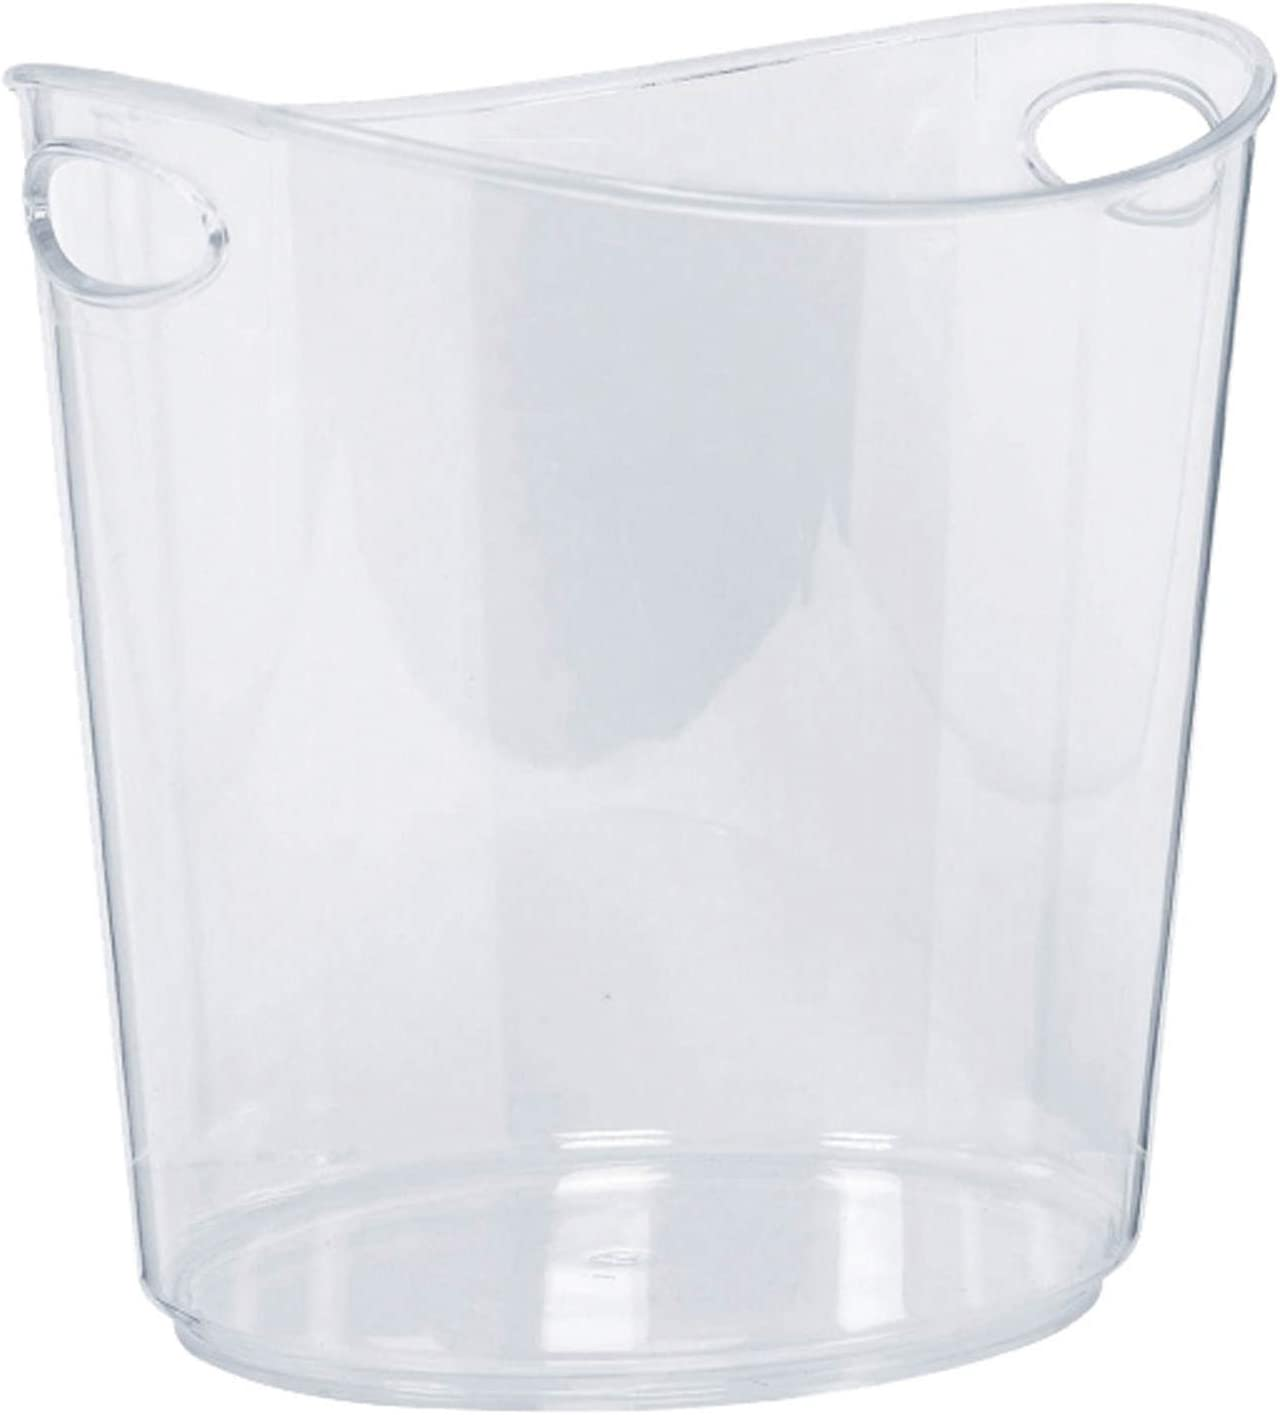 Clear Ice Bucket